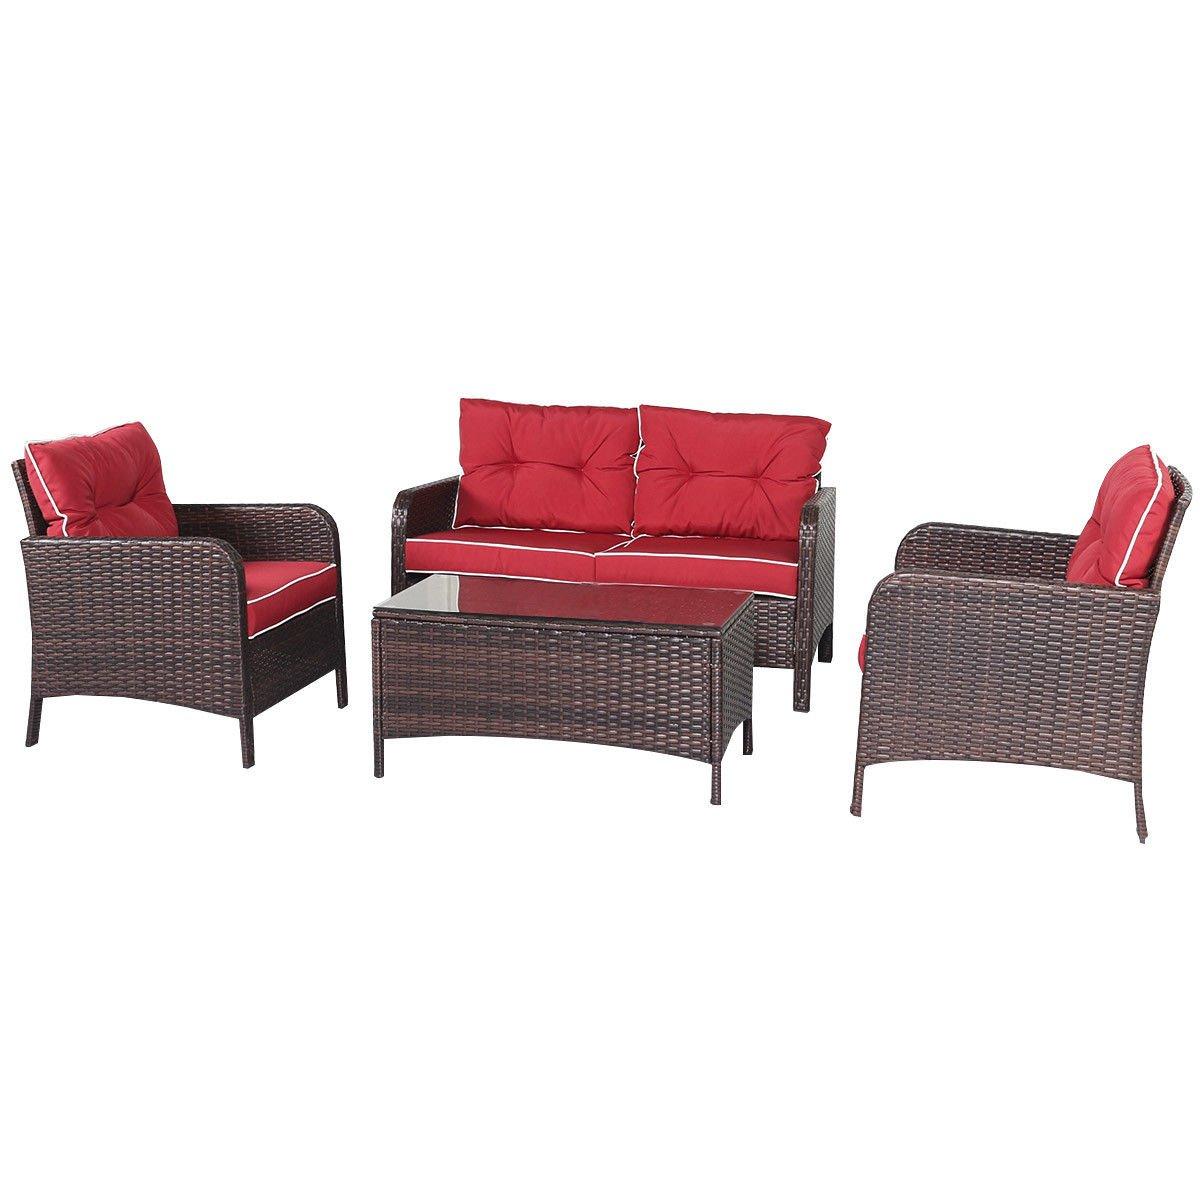 Cool Amazon Com Outdoor Rattan Furniture 2 Chairs Sofa Coffee Spiritservingveterans Wood Chair Design Ideas Spiritservingveteransorg